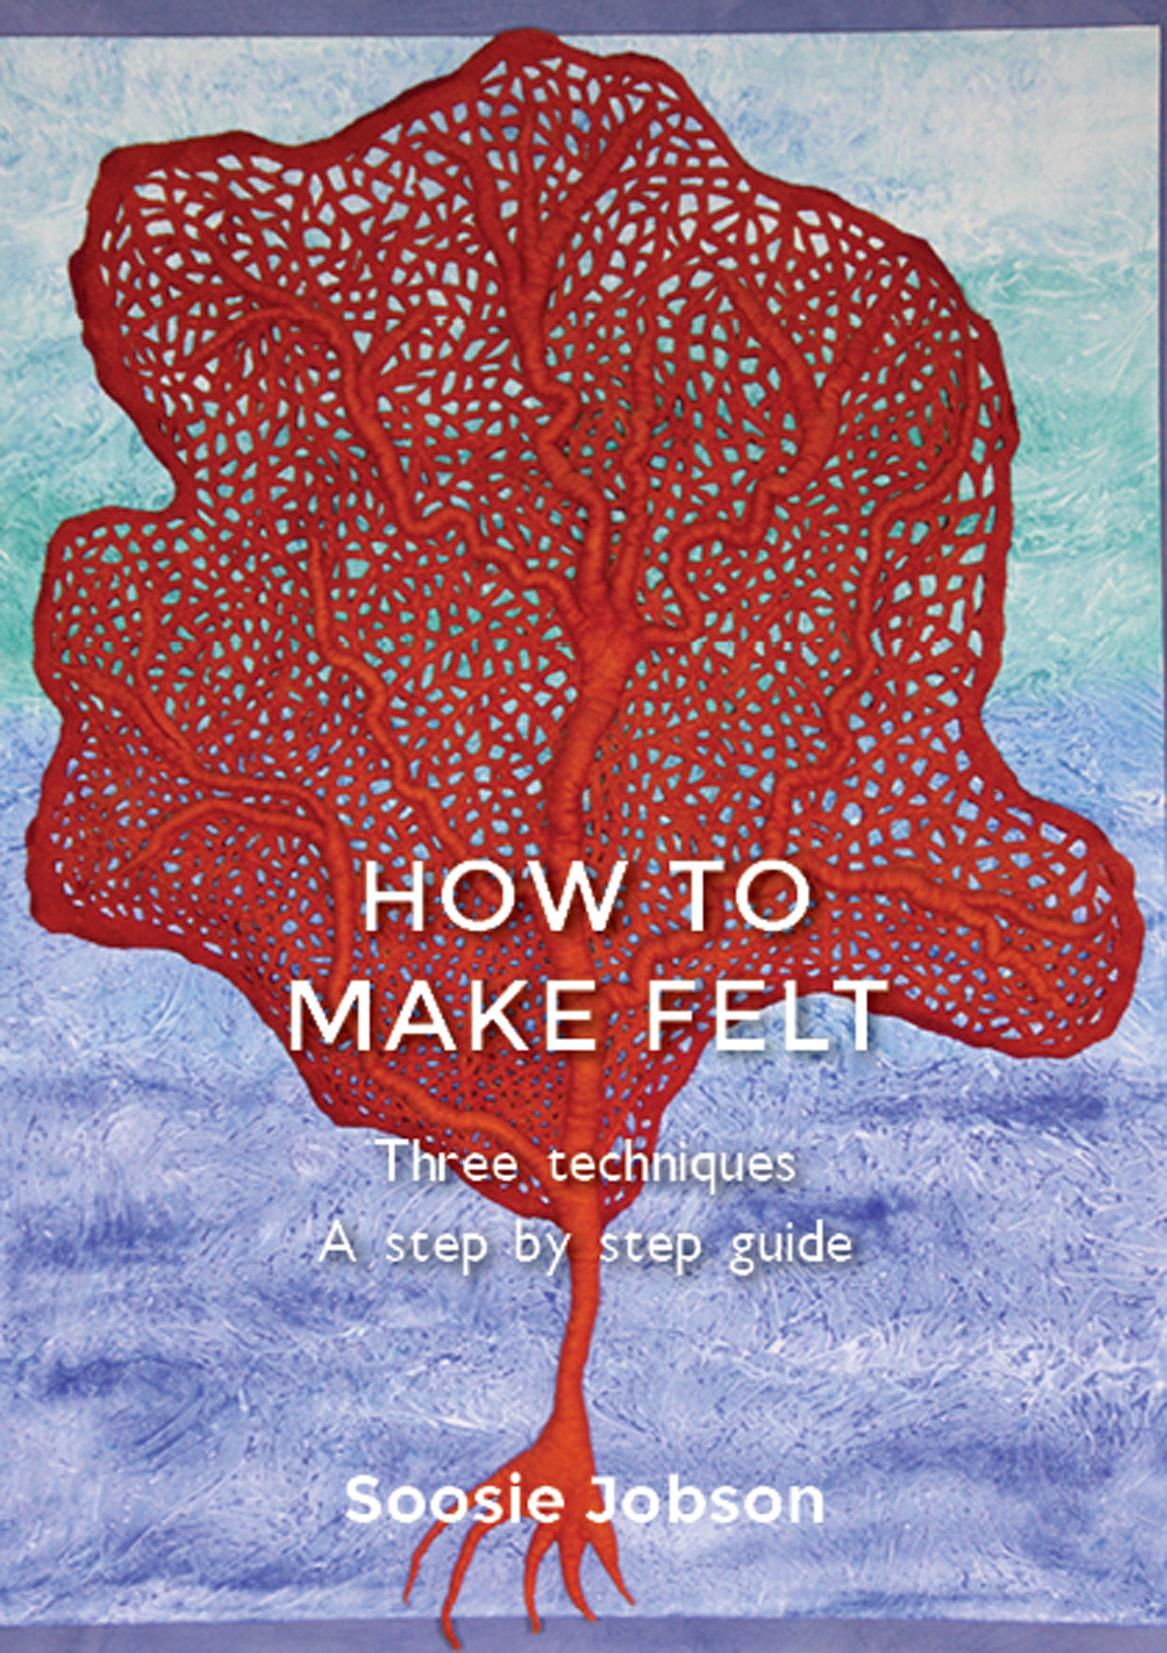 How to Make Felt - 3 Techniques